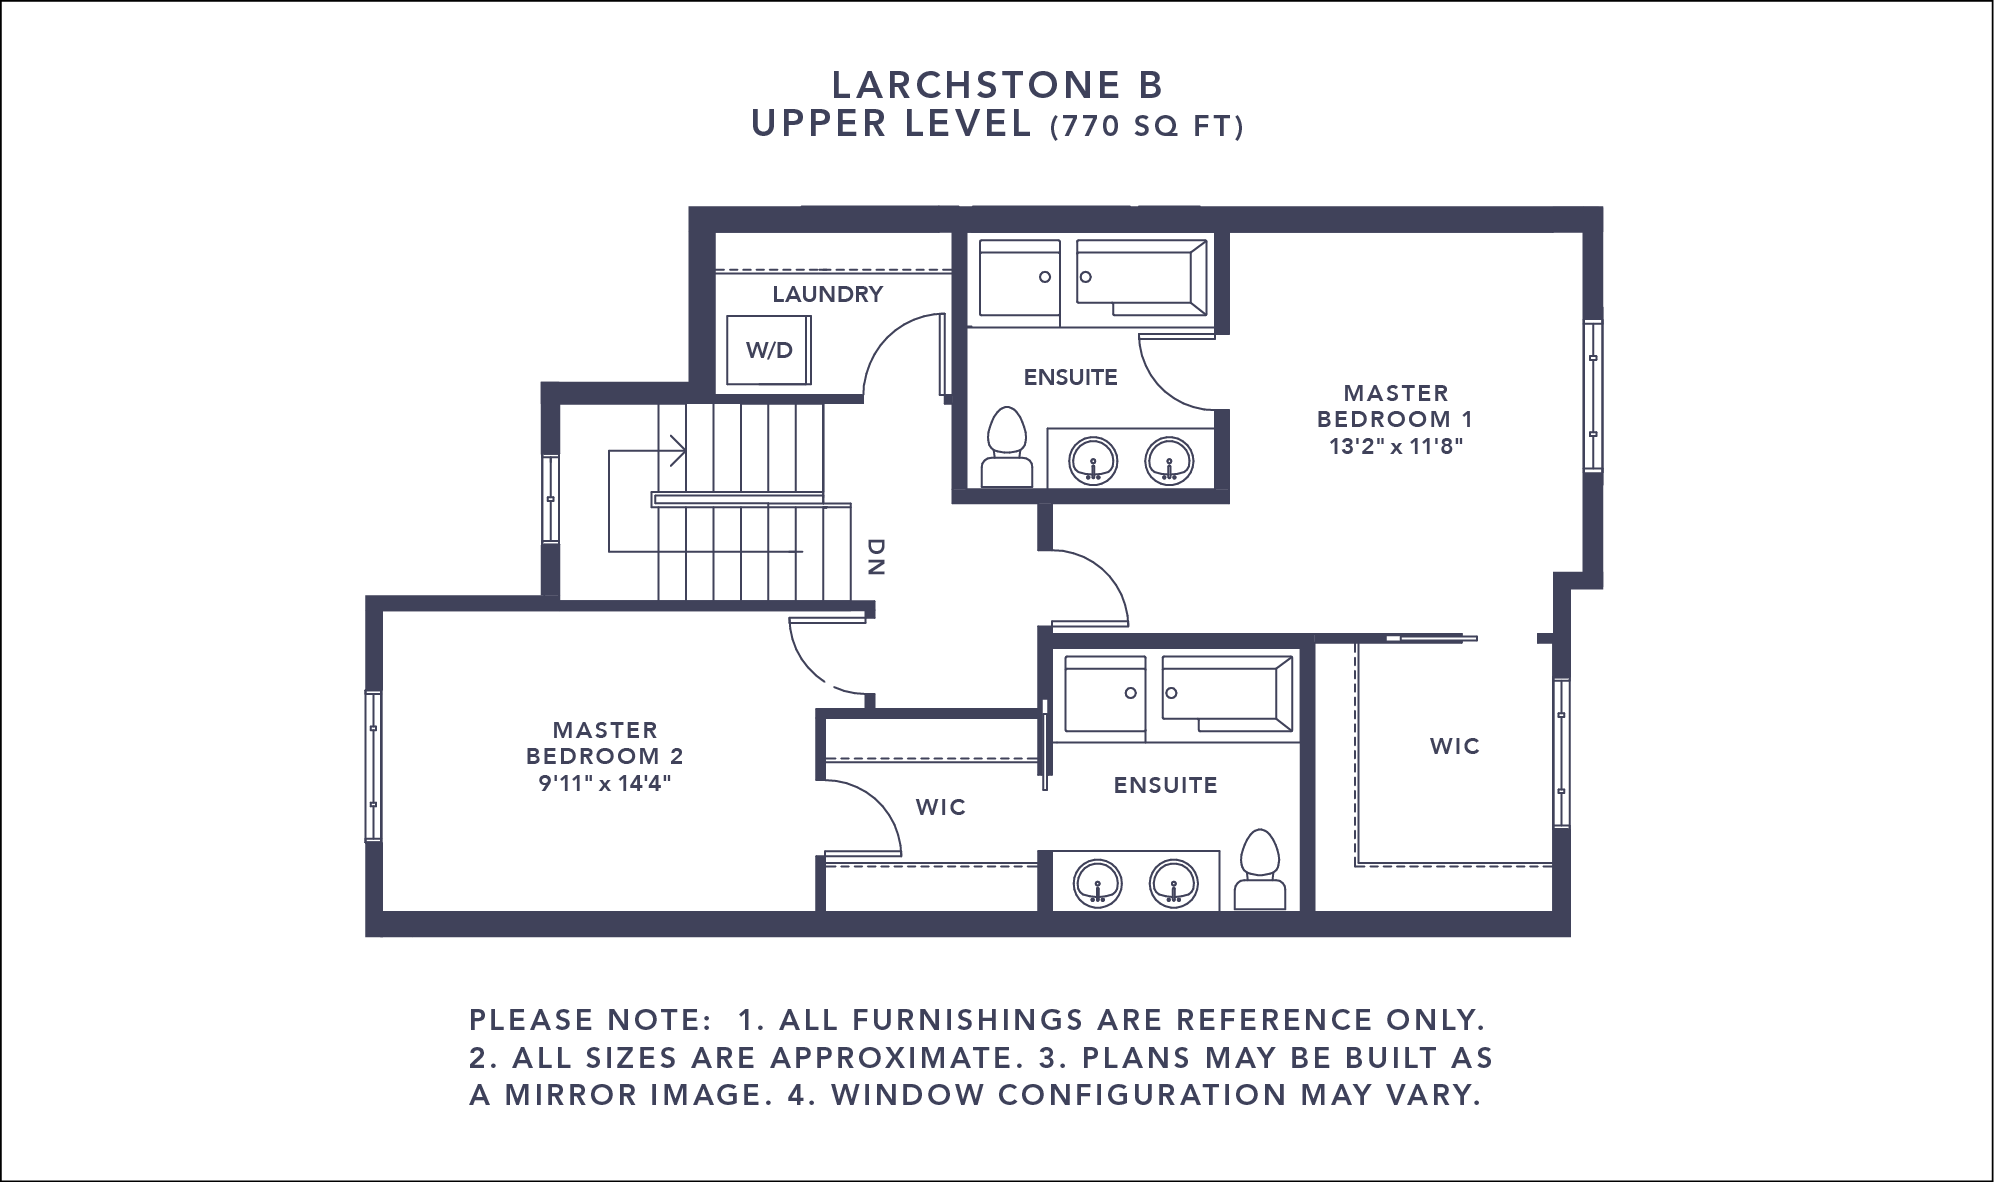 Larchstone B Floorplan - Upper Level